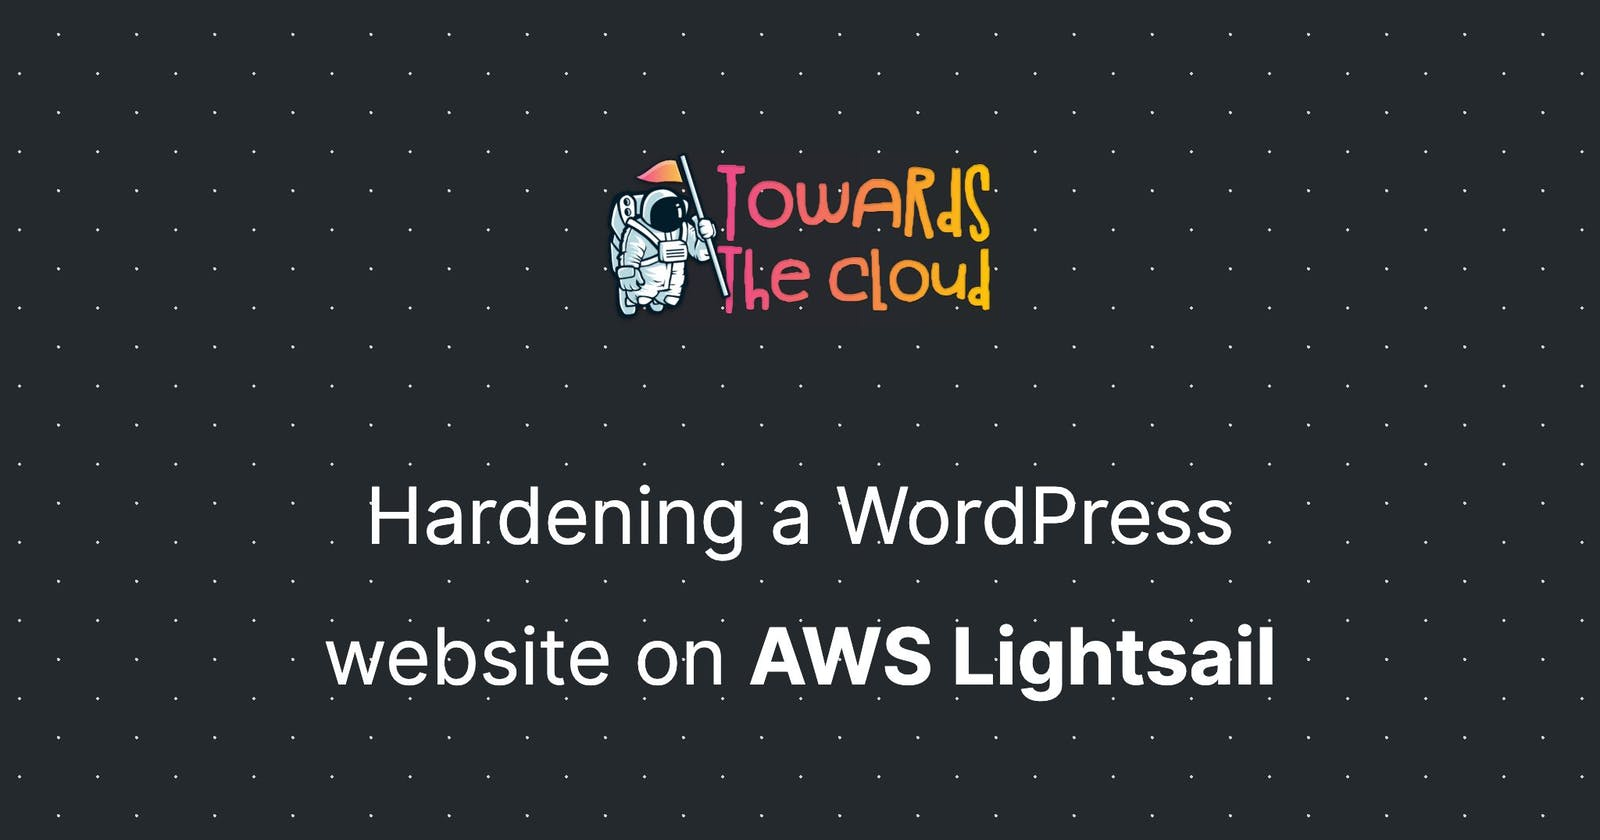 Hardening a WordPress website on AWS Lightsail